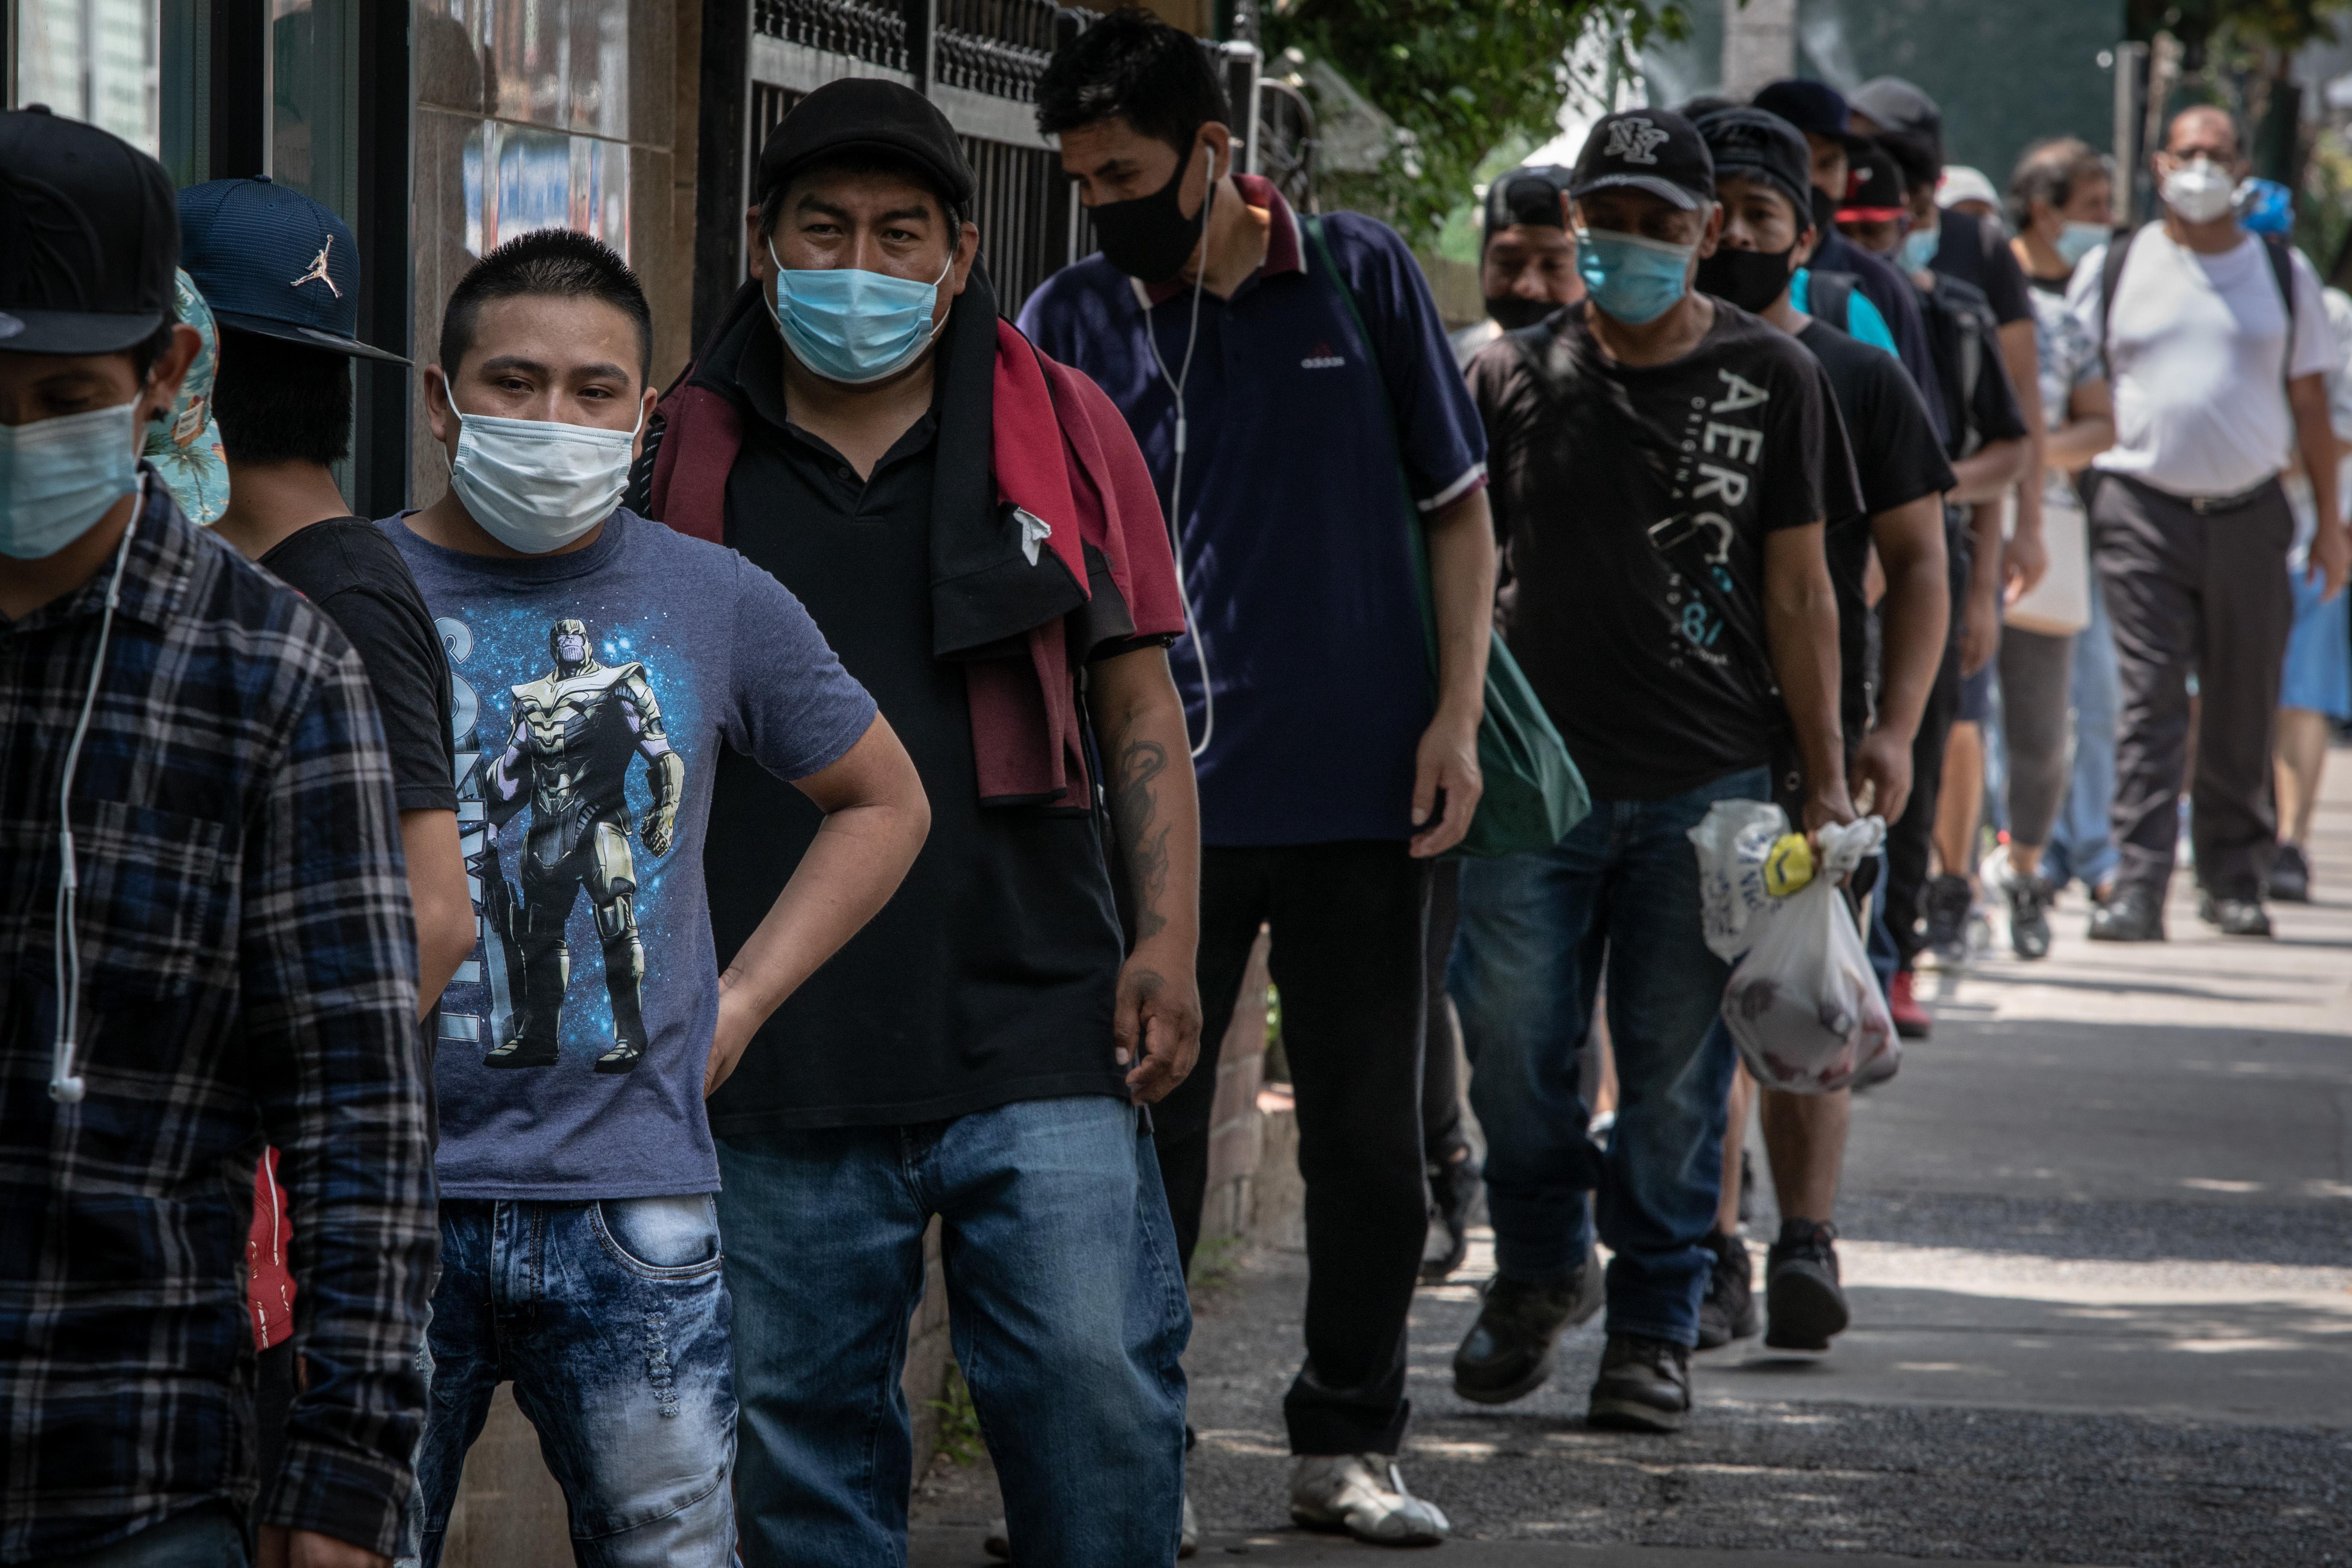 Men in masks waiting in line